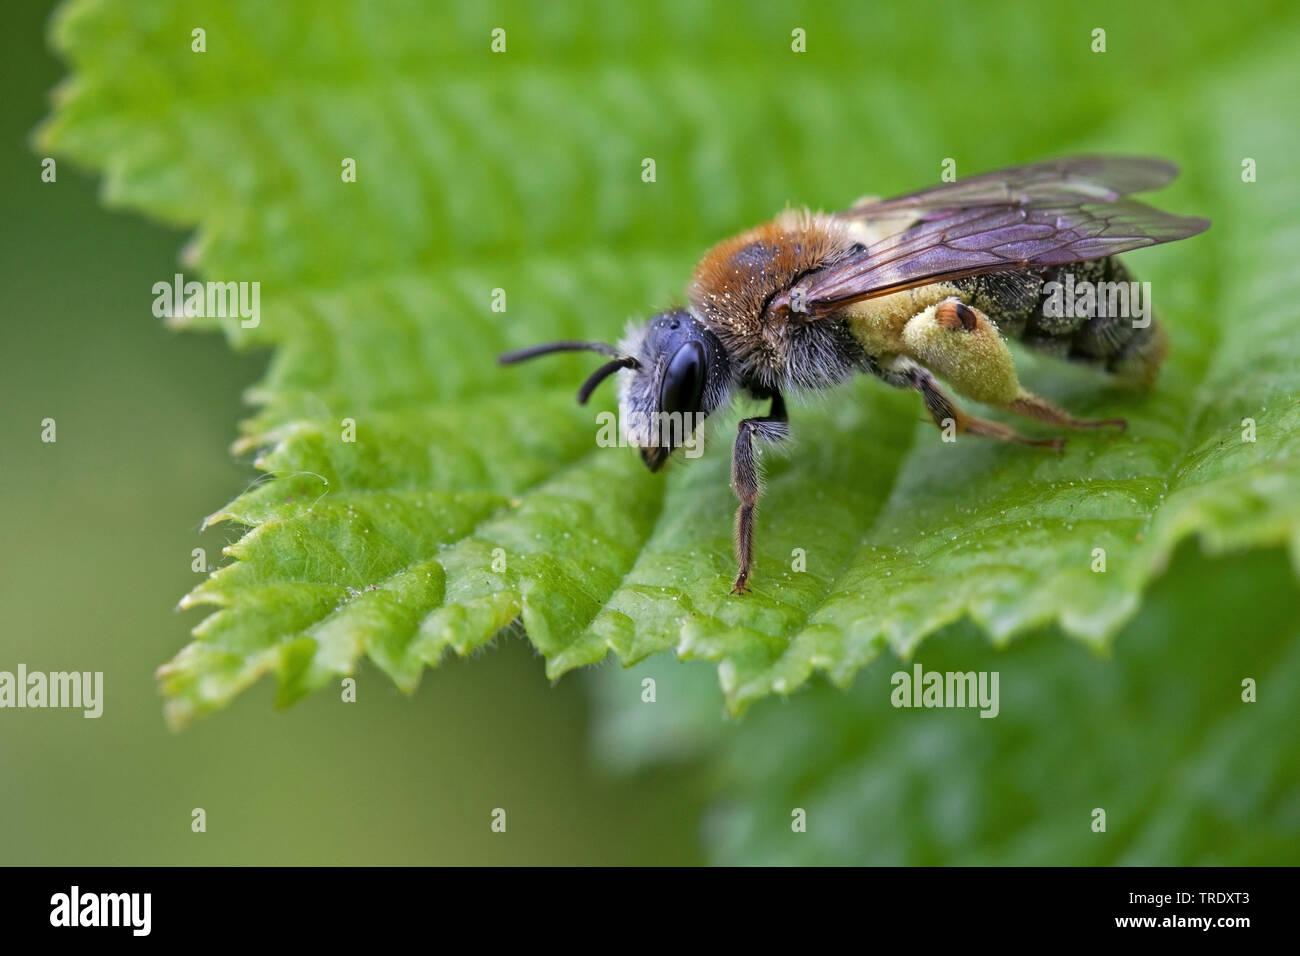 Rotschopfige Sandbiene (Andrena haemorrhoa), sitzt auf einem Blatt, Niederlande | Roodgatje, Early Mining Bee, Andrena haemorrhoa (Andrena haemorrhoa) - Stock Image